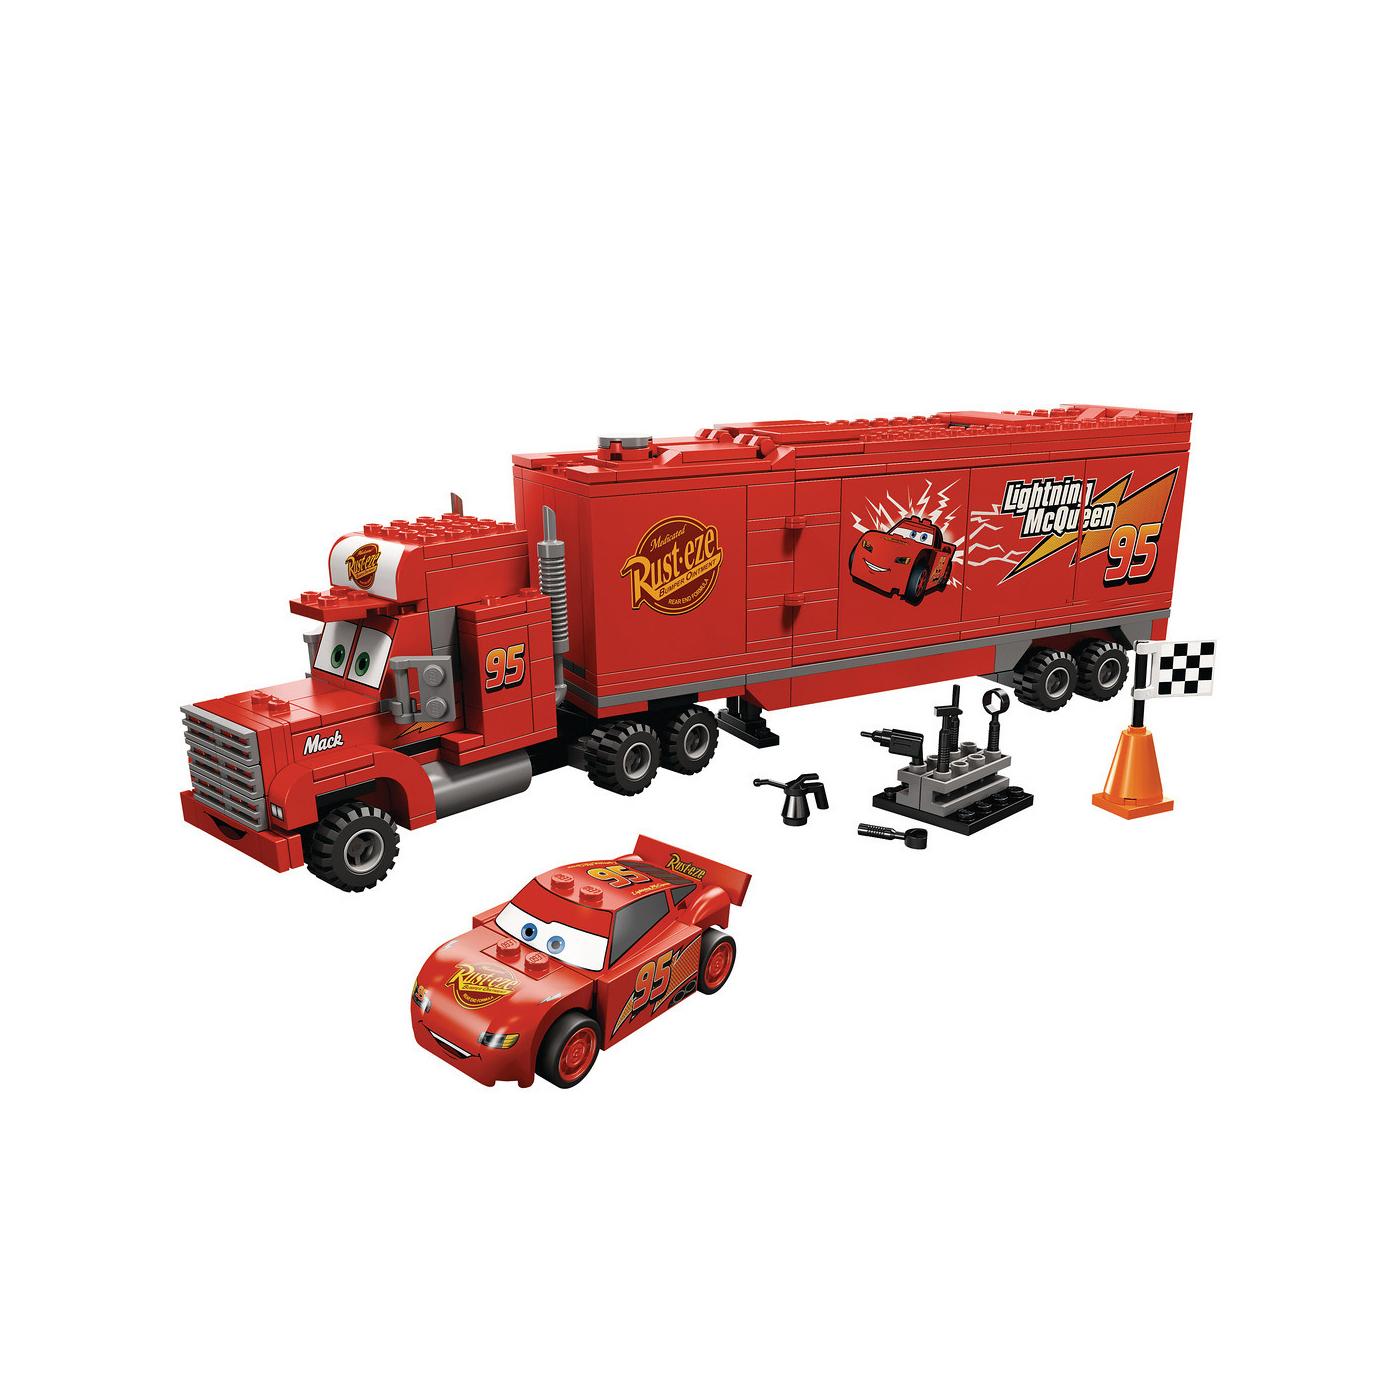 8486 Mack\'s Team Truck   Brickipedia   FANDOM powered by Wikia